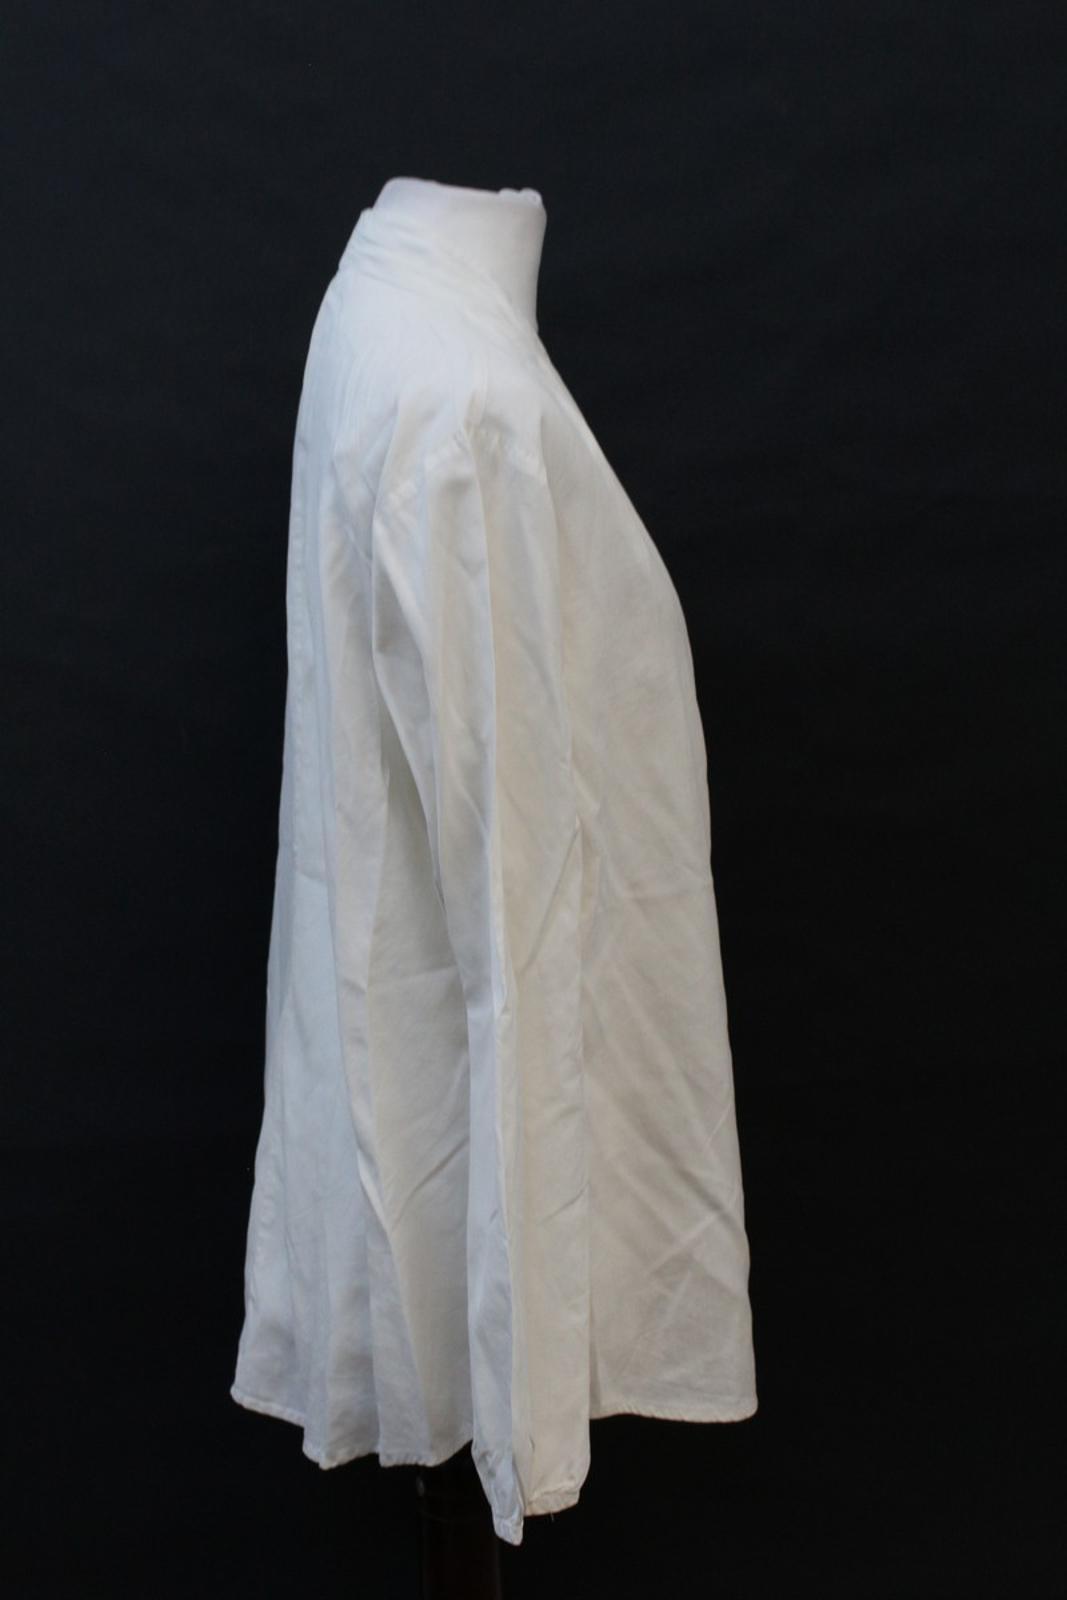 Orvis-Damas-Marfil-Seda-manga-larga-escote-en-forma-de-V-Blusa-Talla-S-UK6-8 miniatura 4